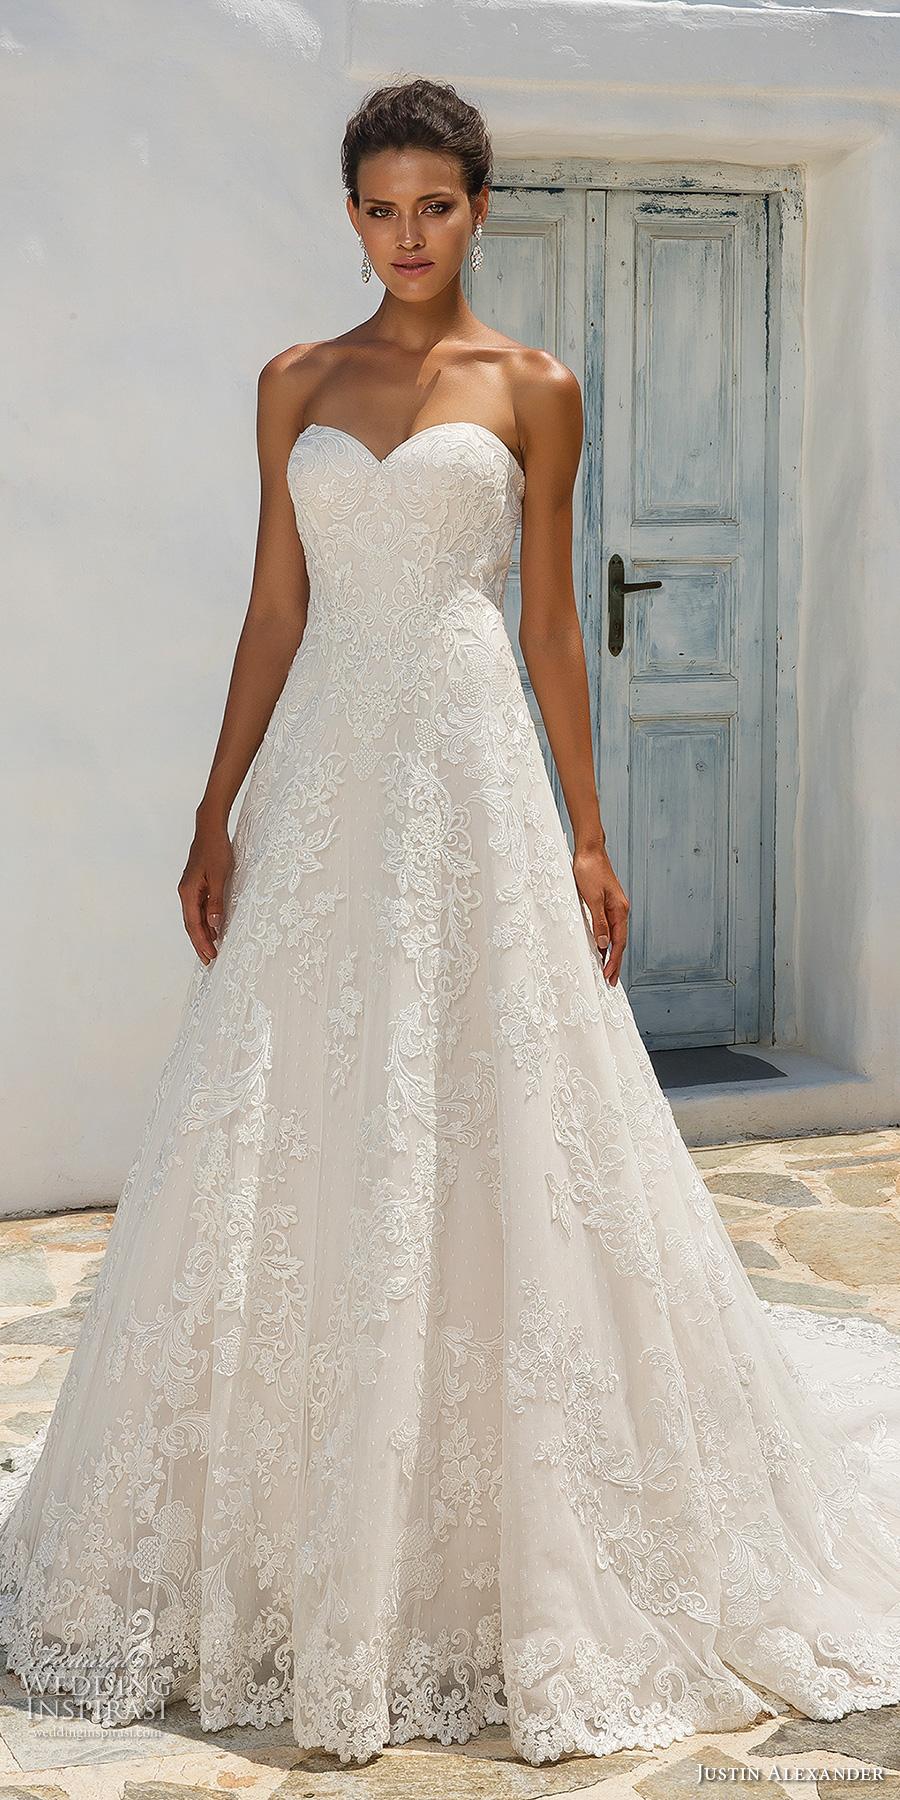 justin alexander 2018 bridal strapless sweetheart neckline full embellishment romantic a line wedding dress chapel train (1) mv